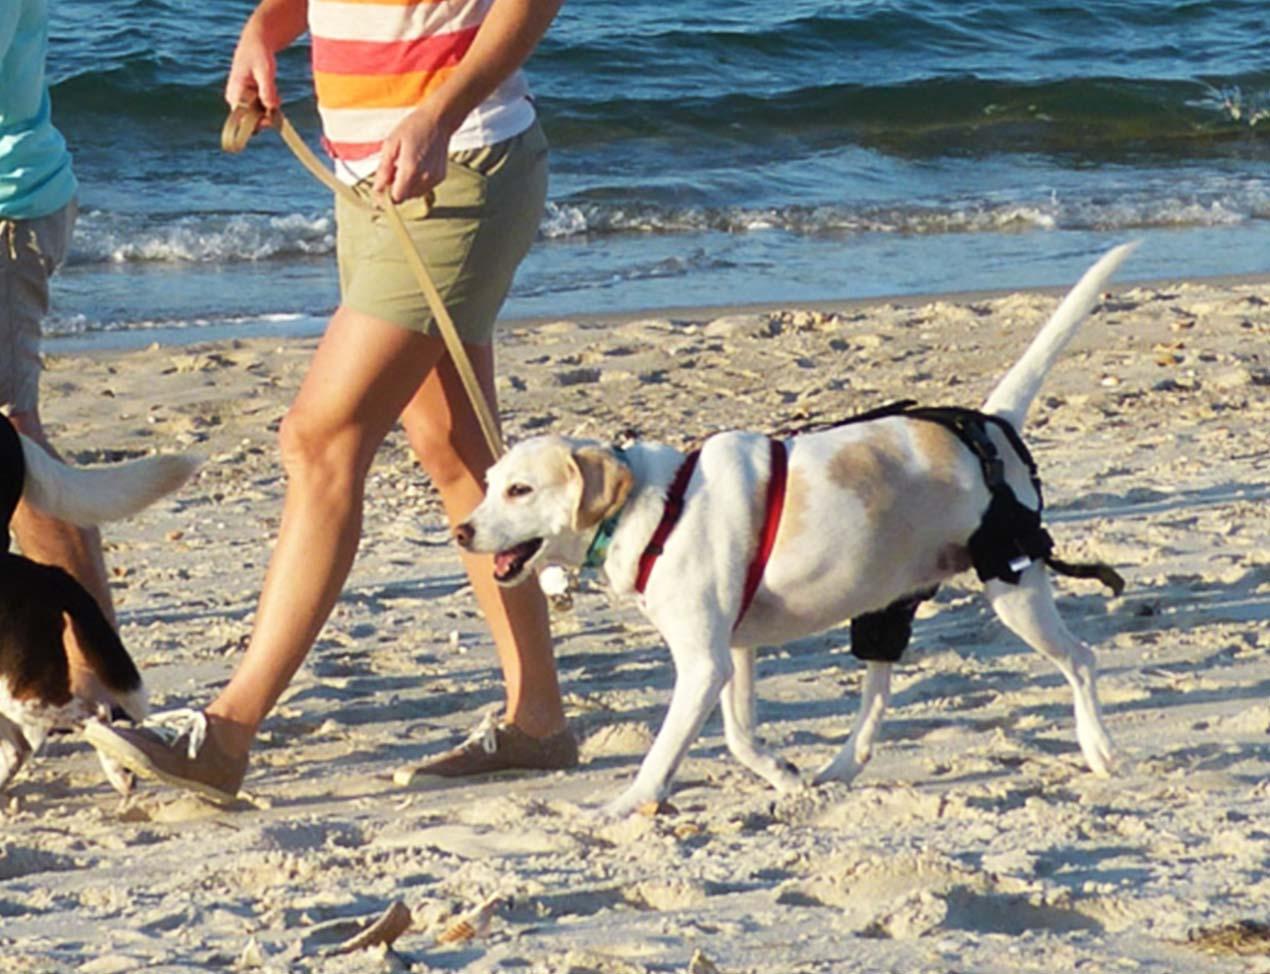 dog walking on beach with knee brace